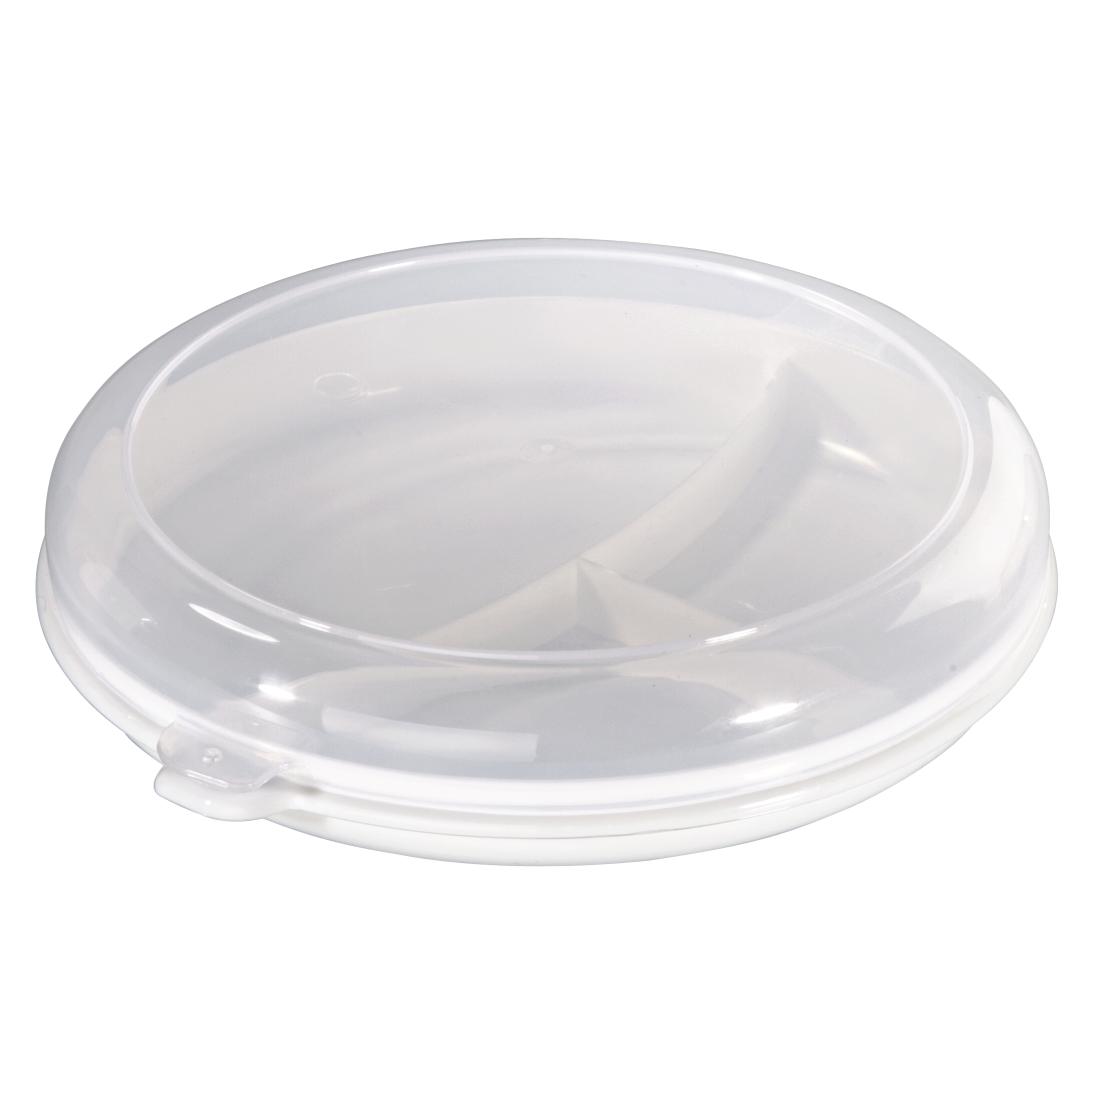 00111043 Xavax Microwave Plate